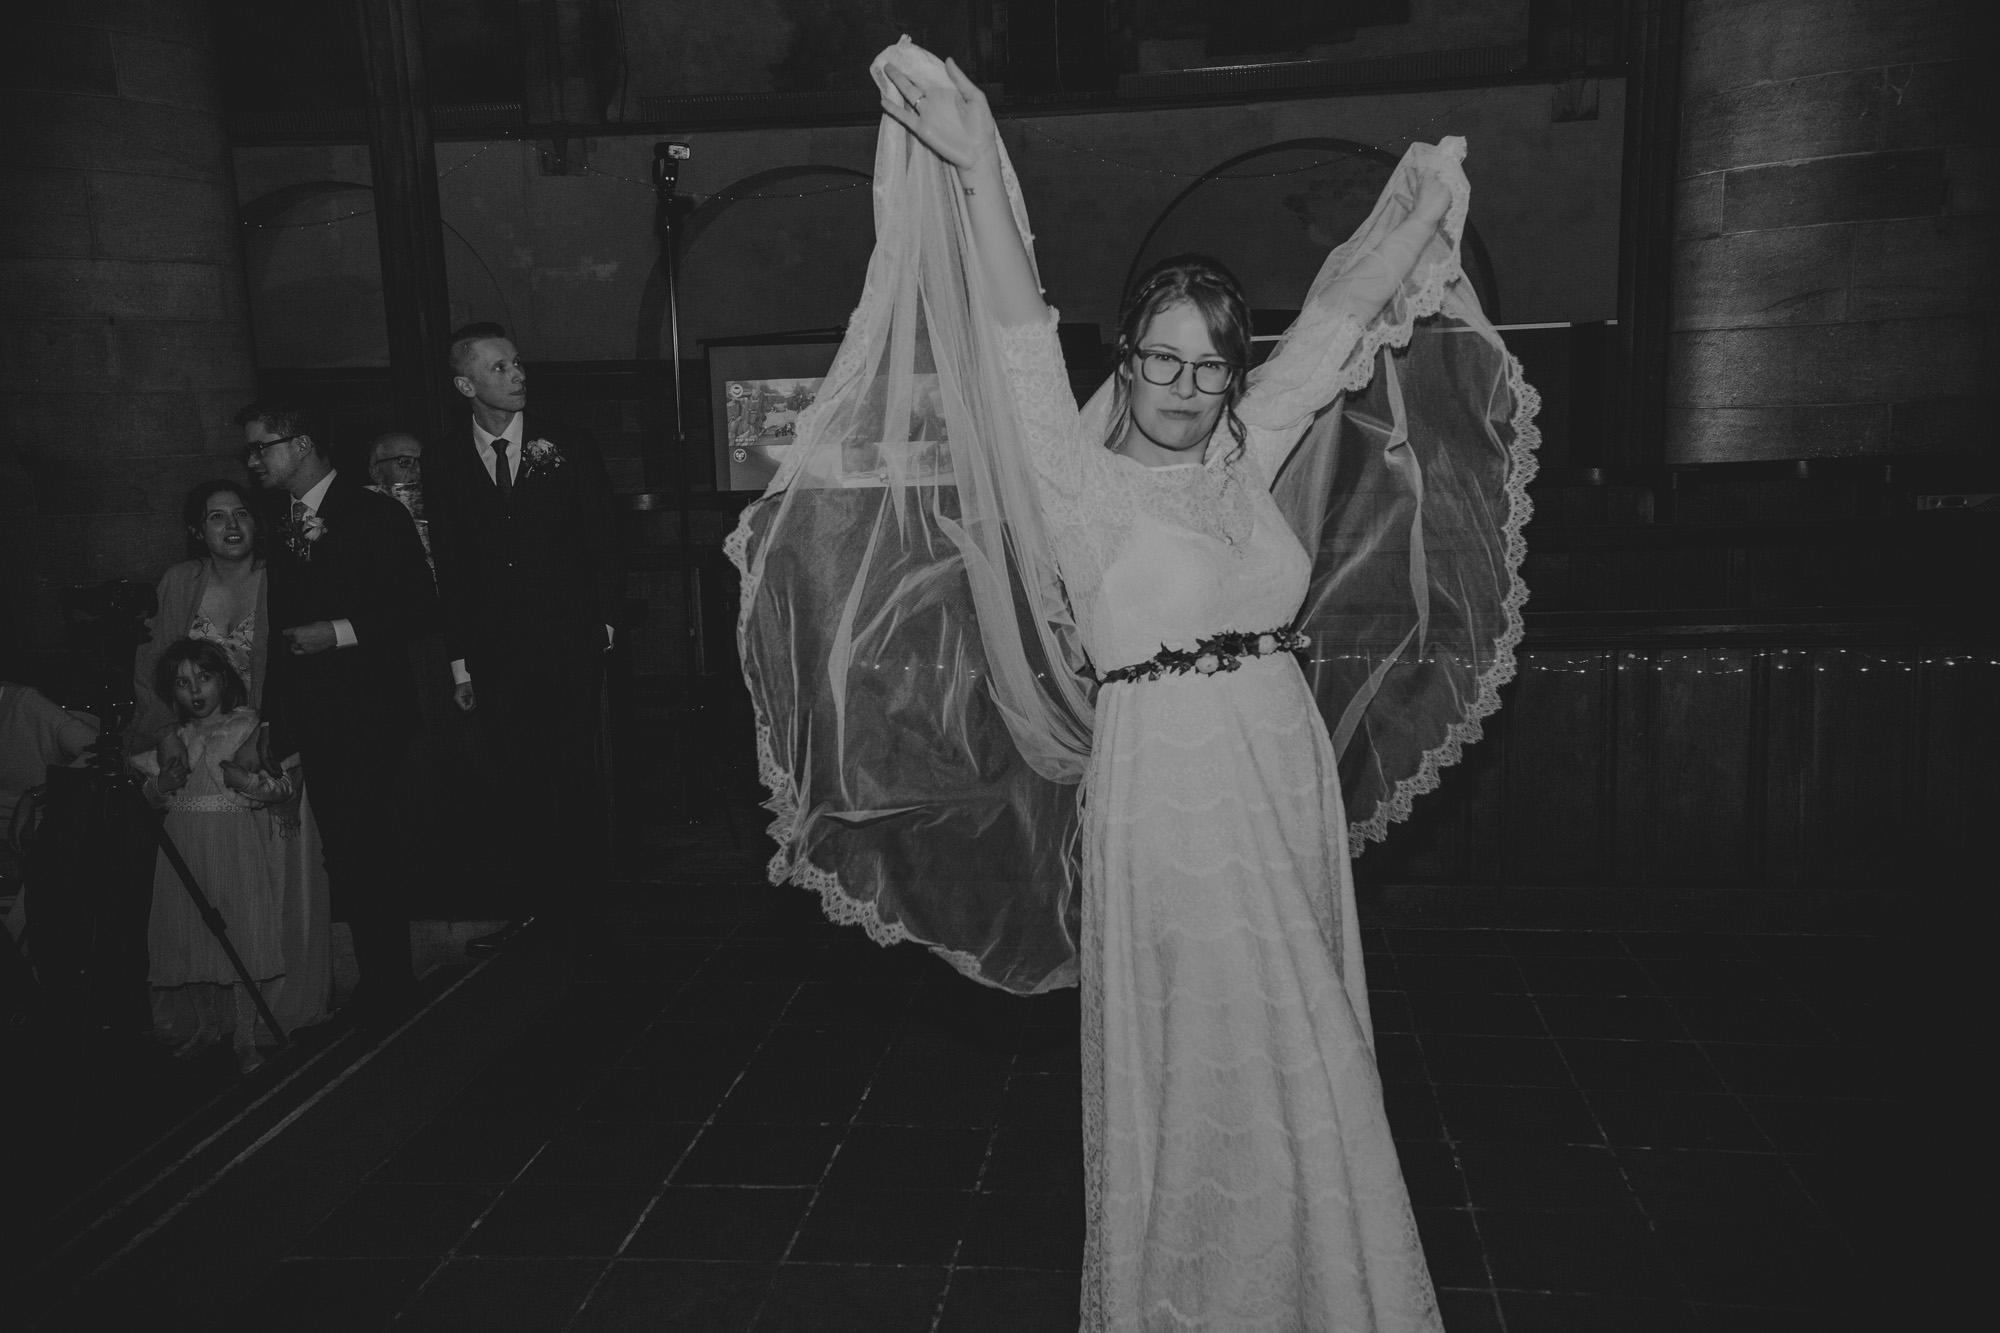 Kate-Beaumont-Bespoke-Bridal-Dahlia-Lace-Wedding-Gown-Cool-Leeds-Wedding-44.jpg